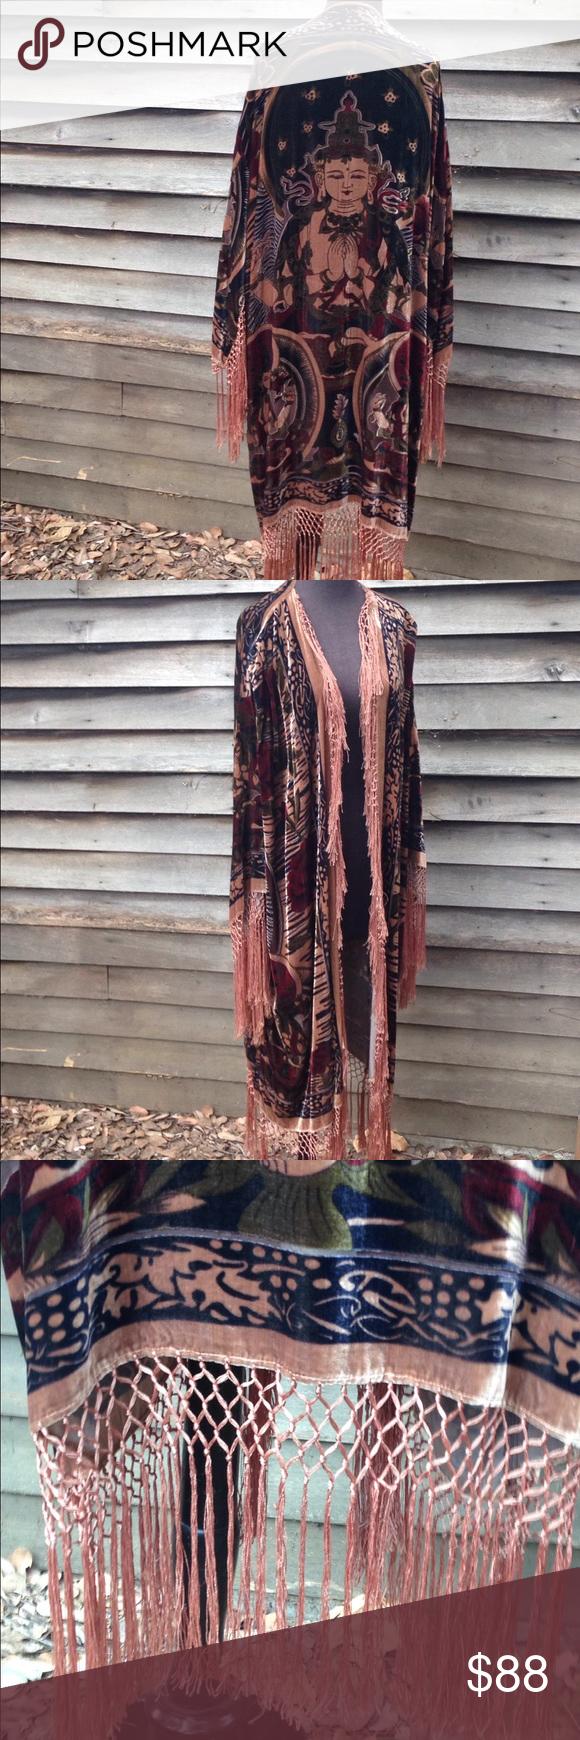 9539c9e99 Silk Buddha Kimono Beautiful Buddha and red rose design velvet kimono with  silk fringe. Vintage